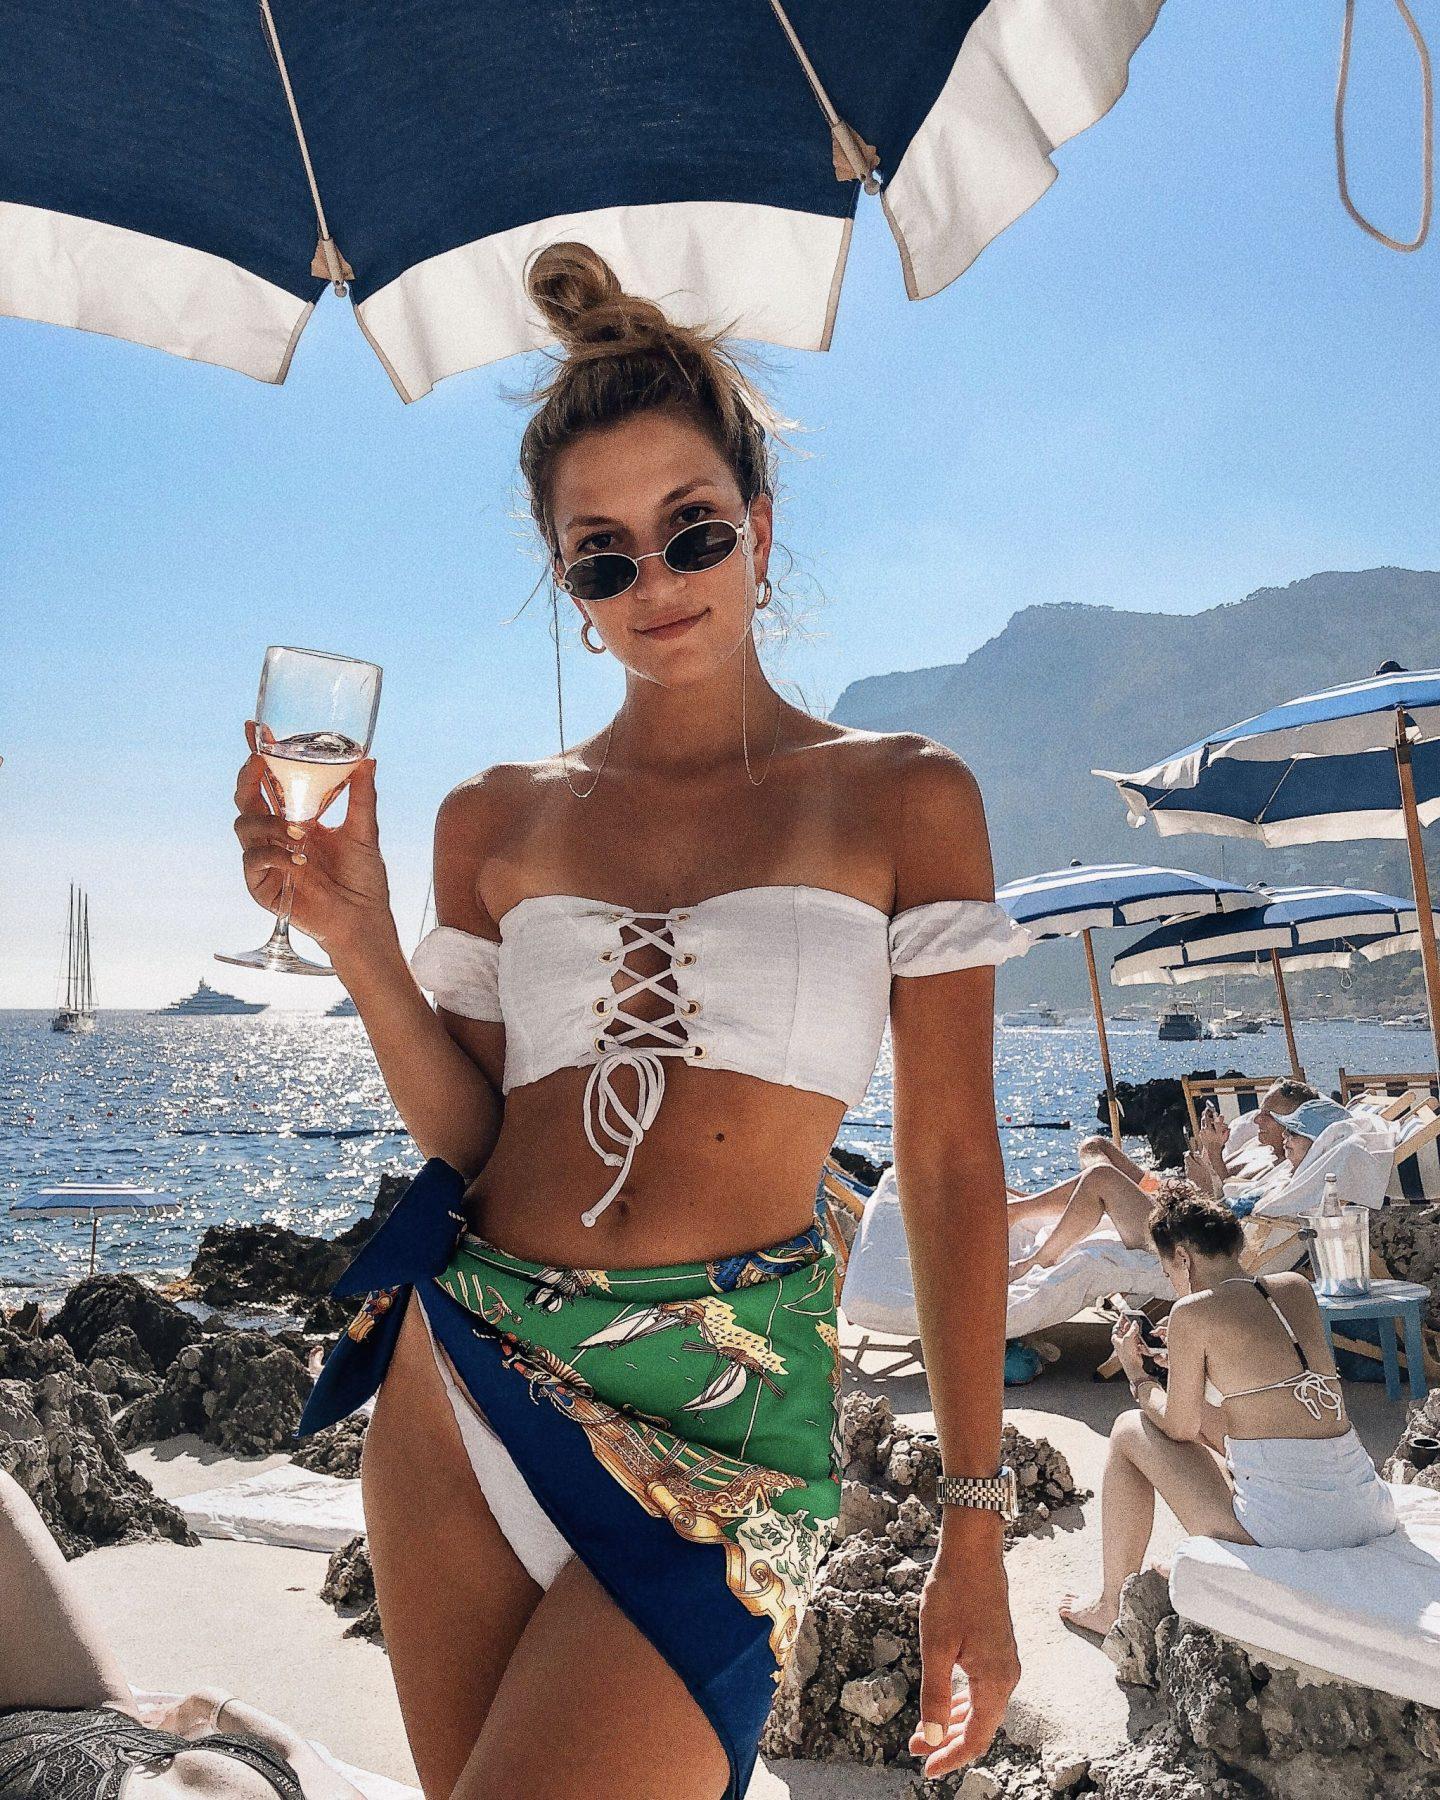 Cassandra DiMicco, Cass DiMicco, Dressed For Dreams, NYC, New York City, New York, Street Style NYC, Street Style 2018, NYC Street Style Street Style Outfits, 2018 Trends, Summer Style, Summer Outfit Inspo, Europe Outfit Inspo, NYC Fashion Blogger, Capri, Capri Italy, Capri Inspo, Beach Bunny Swimwear, Le Specs Love Train, Le Specs, Corset Bikini, Lace Up Bikini, Vintage Hermes Scarf, Hermes Scarf, Vacation Outfit Inspo, Beach Outfit Inspo